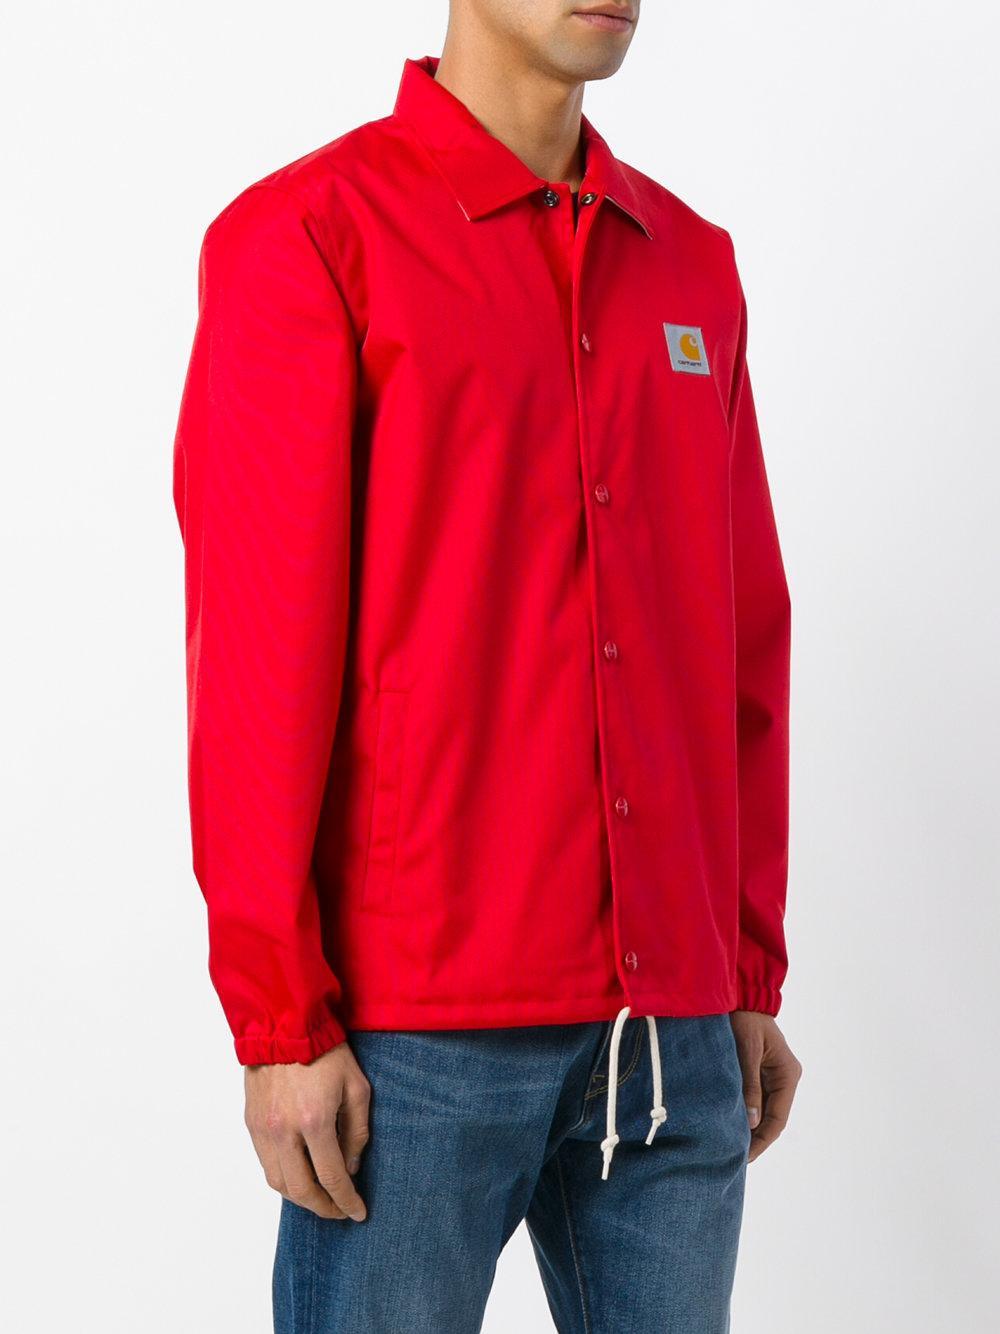 Lyst Carhartt Watch Jacket Men Cotton Nylon